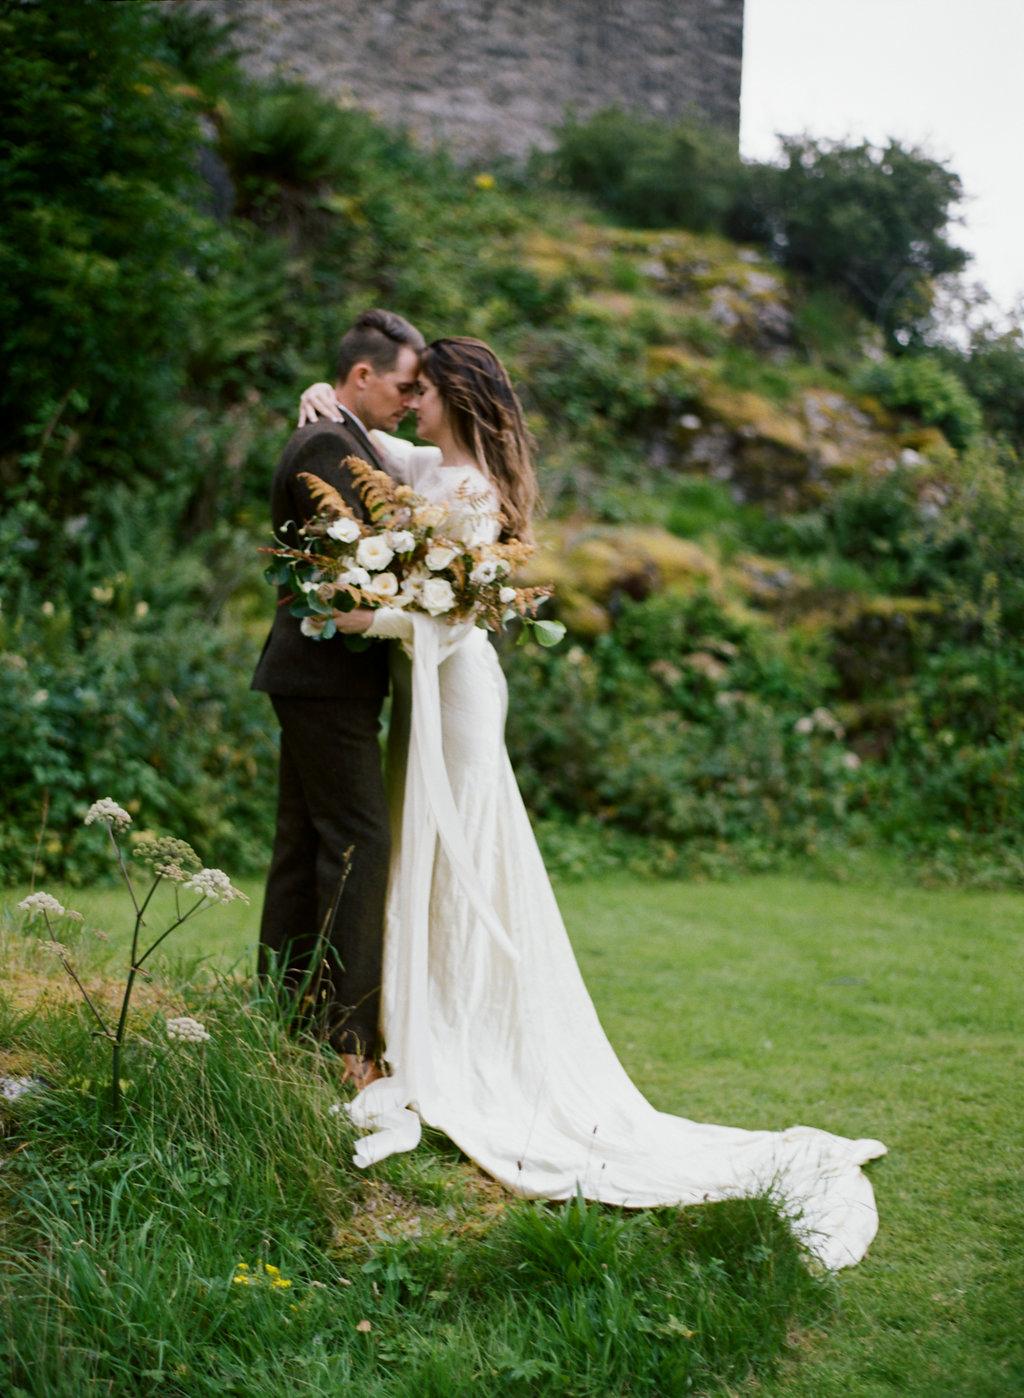 Scotland-Prewedding-highlands-castle-Engagment-Photos-Katie-Grant (7 of 139).jpg